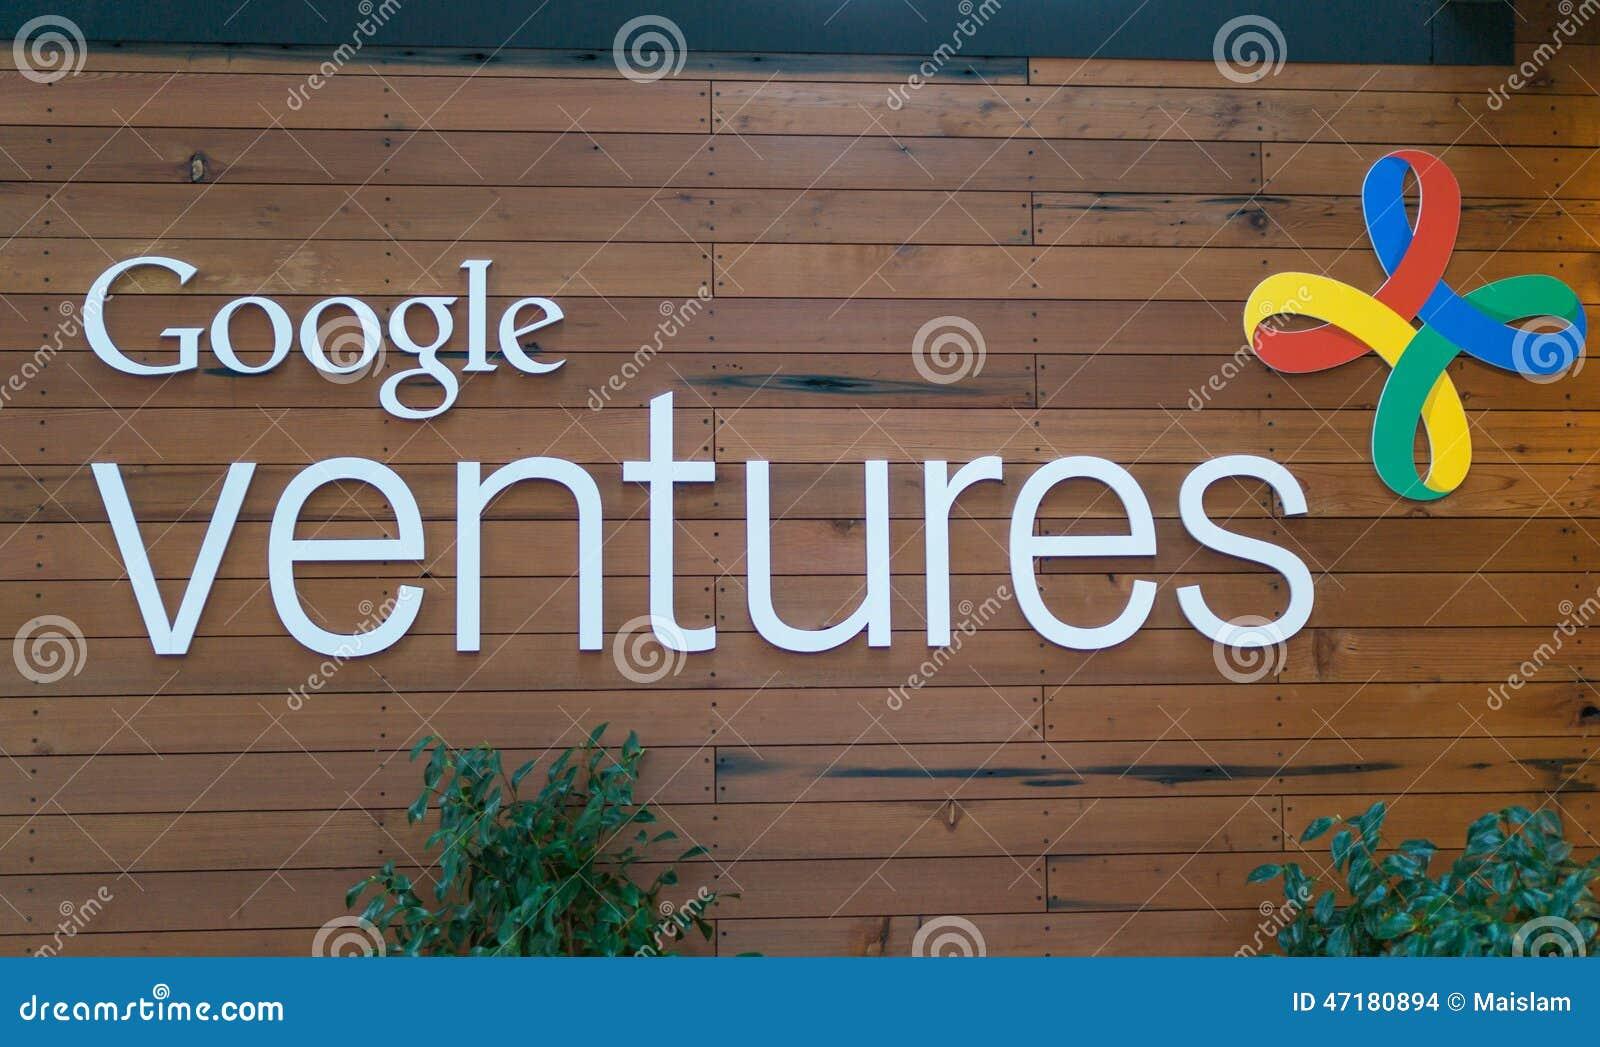 Google ventures theme - Exterior View Of Google Ventures Office Editorial Stock Image